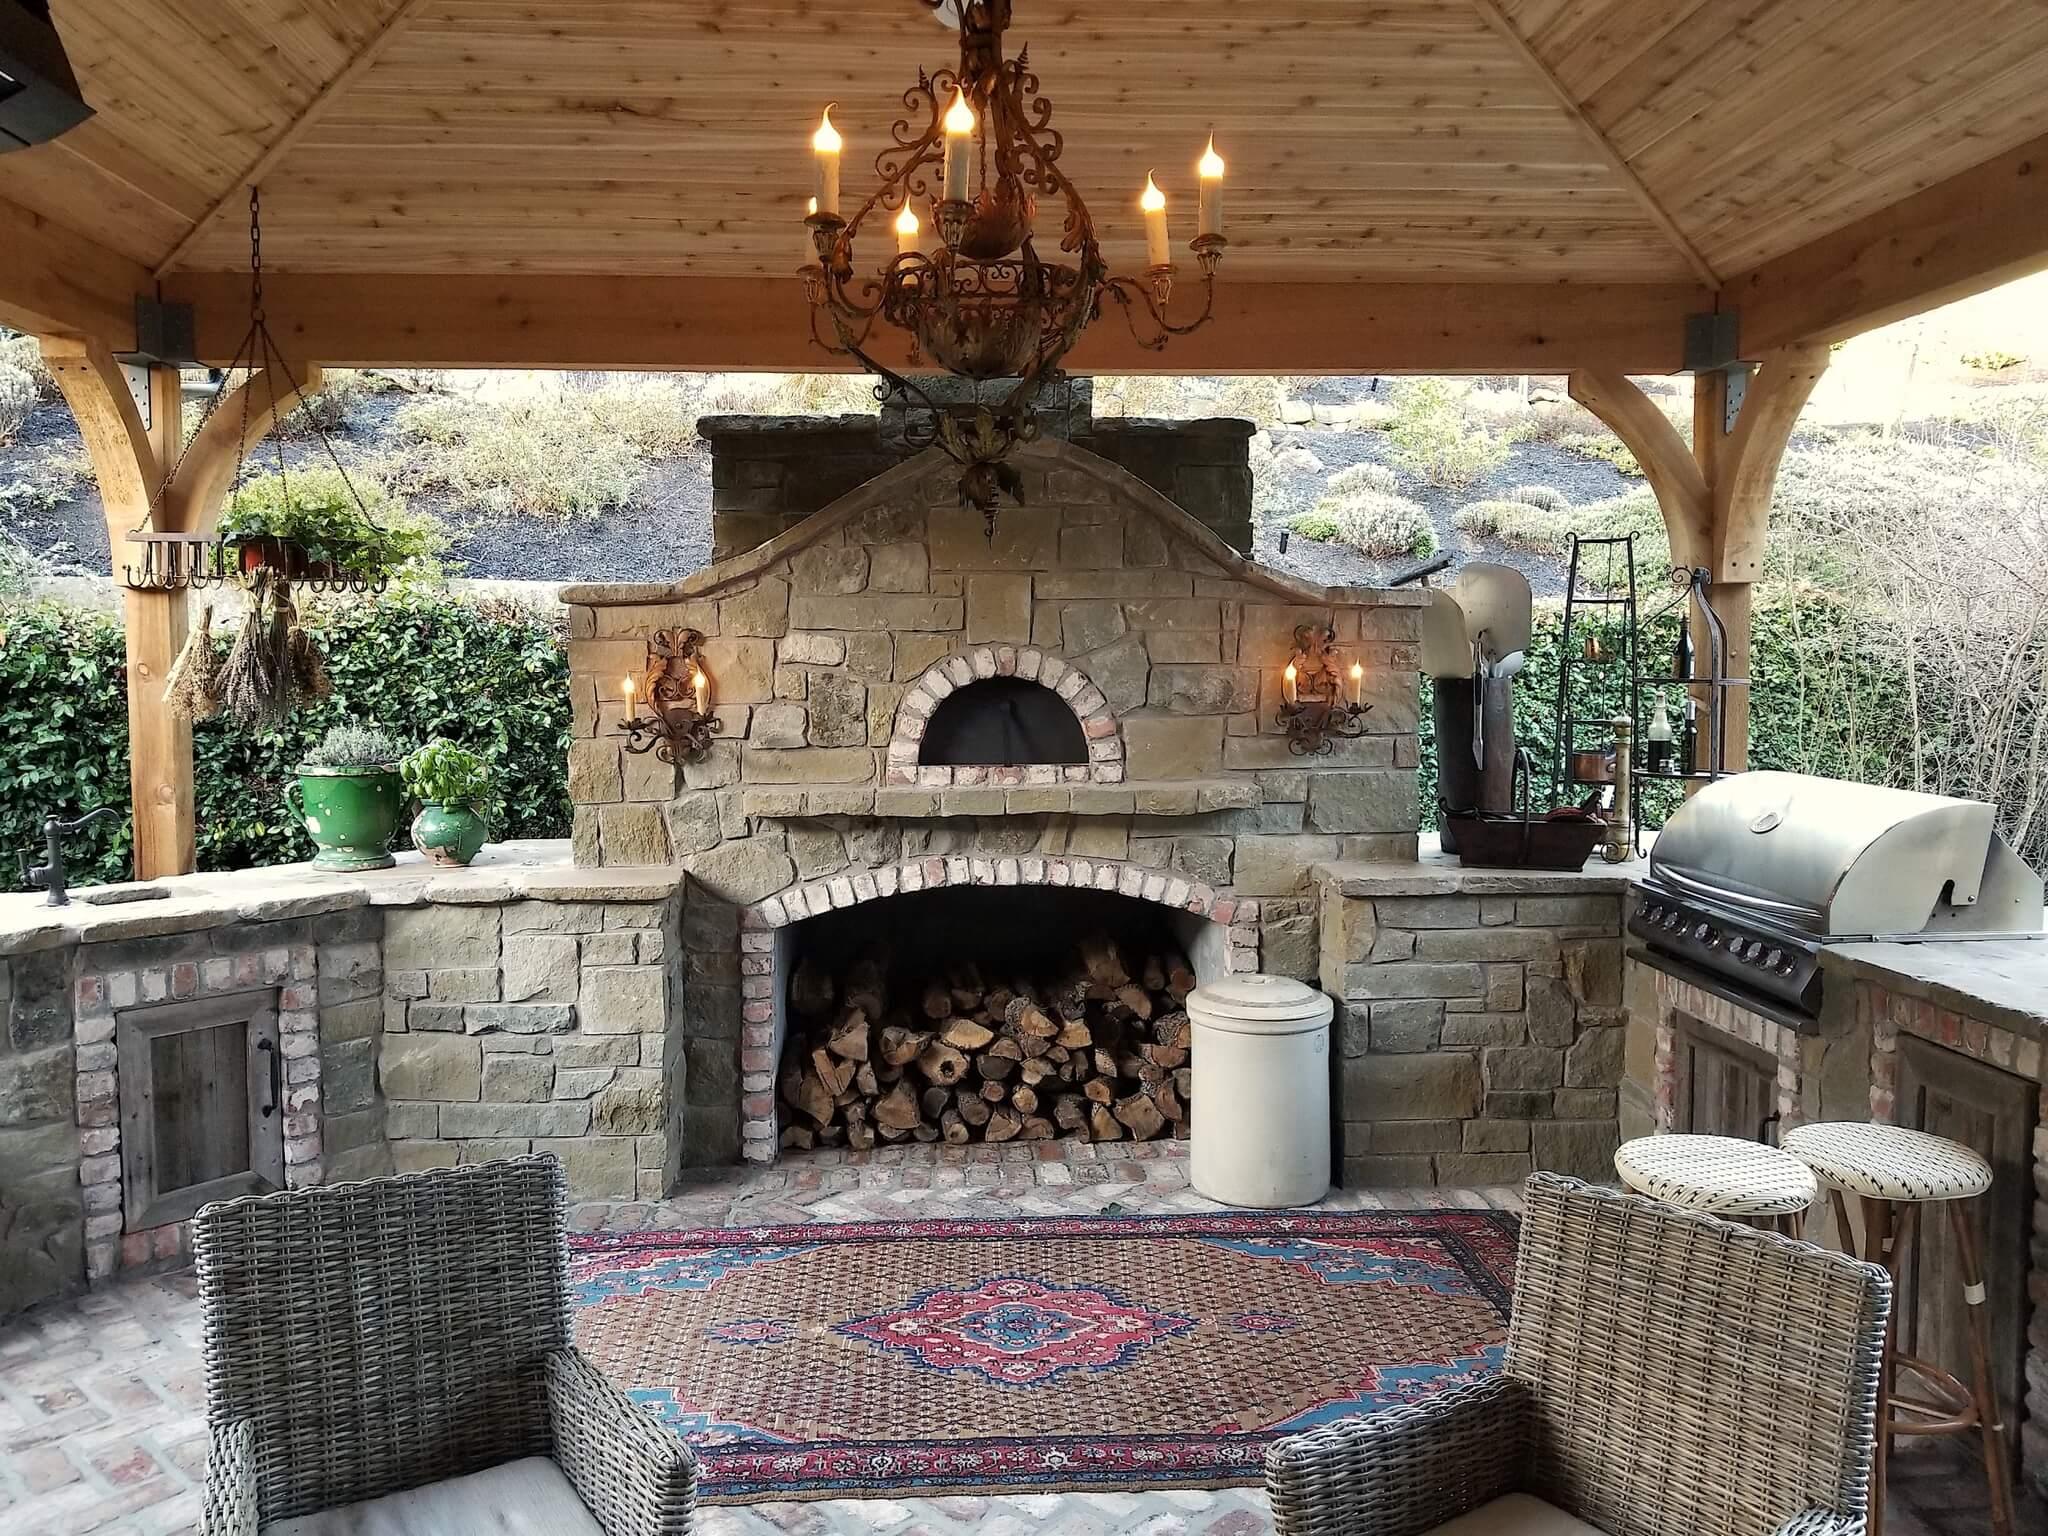 Mugnaini oven in an outdoor setting